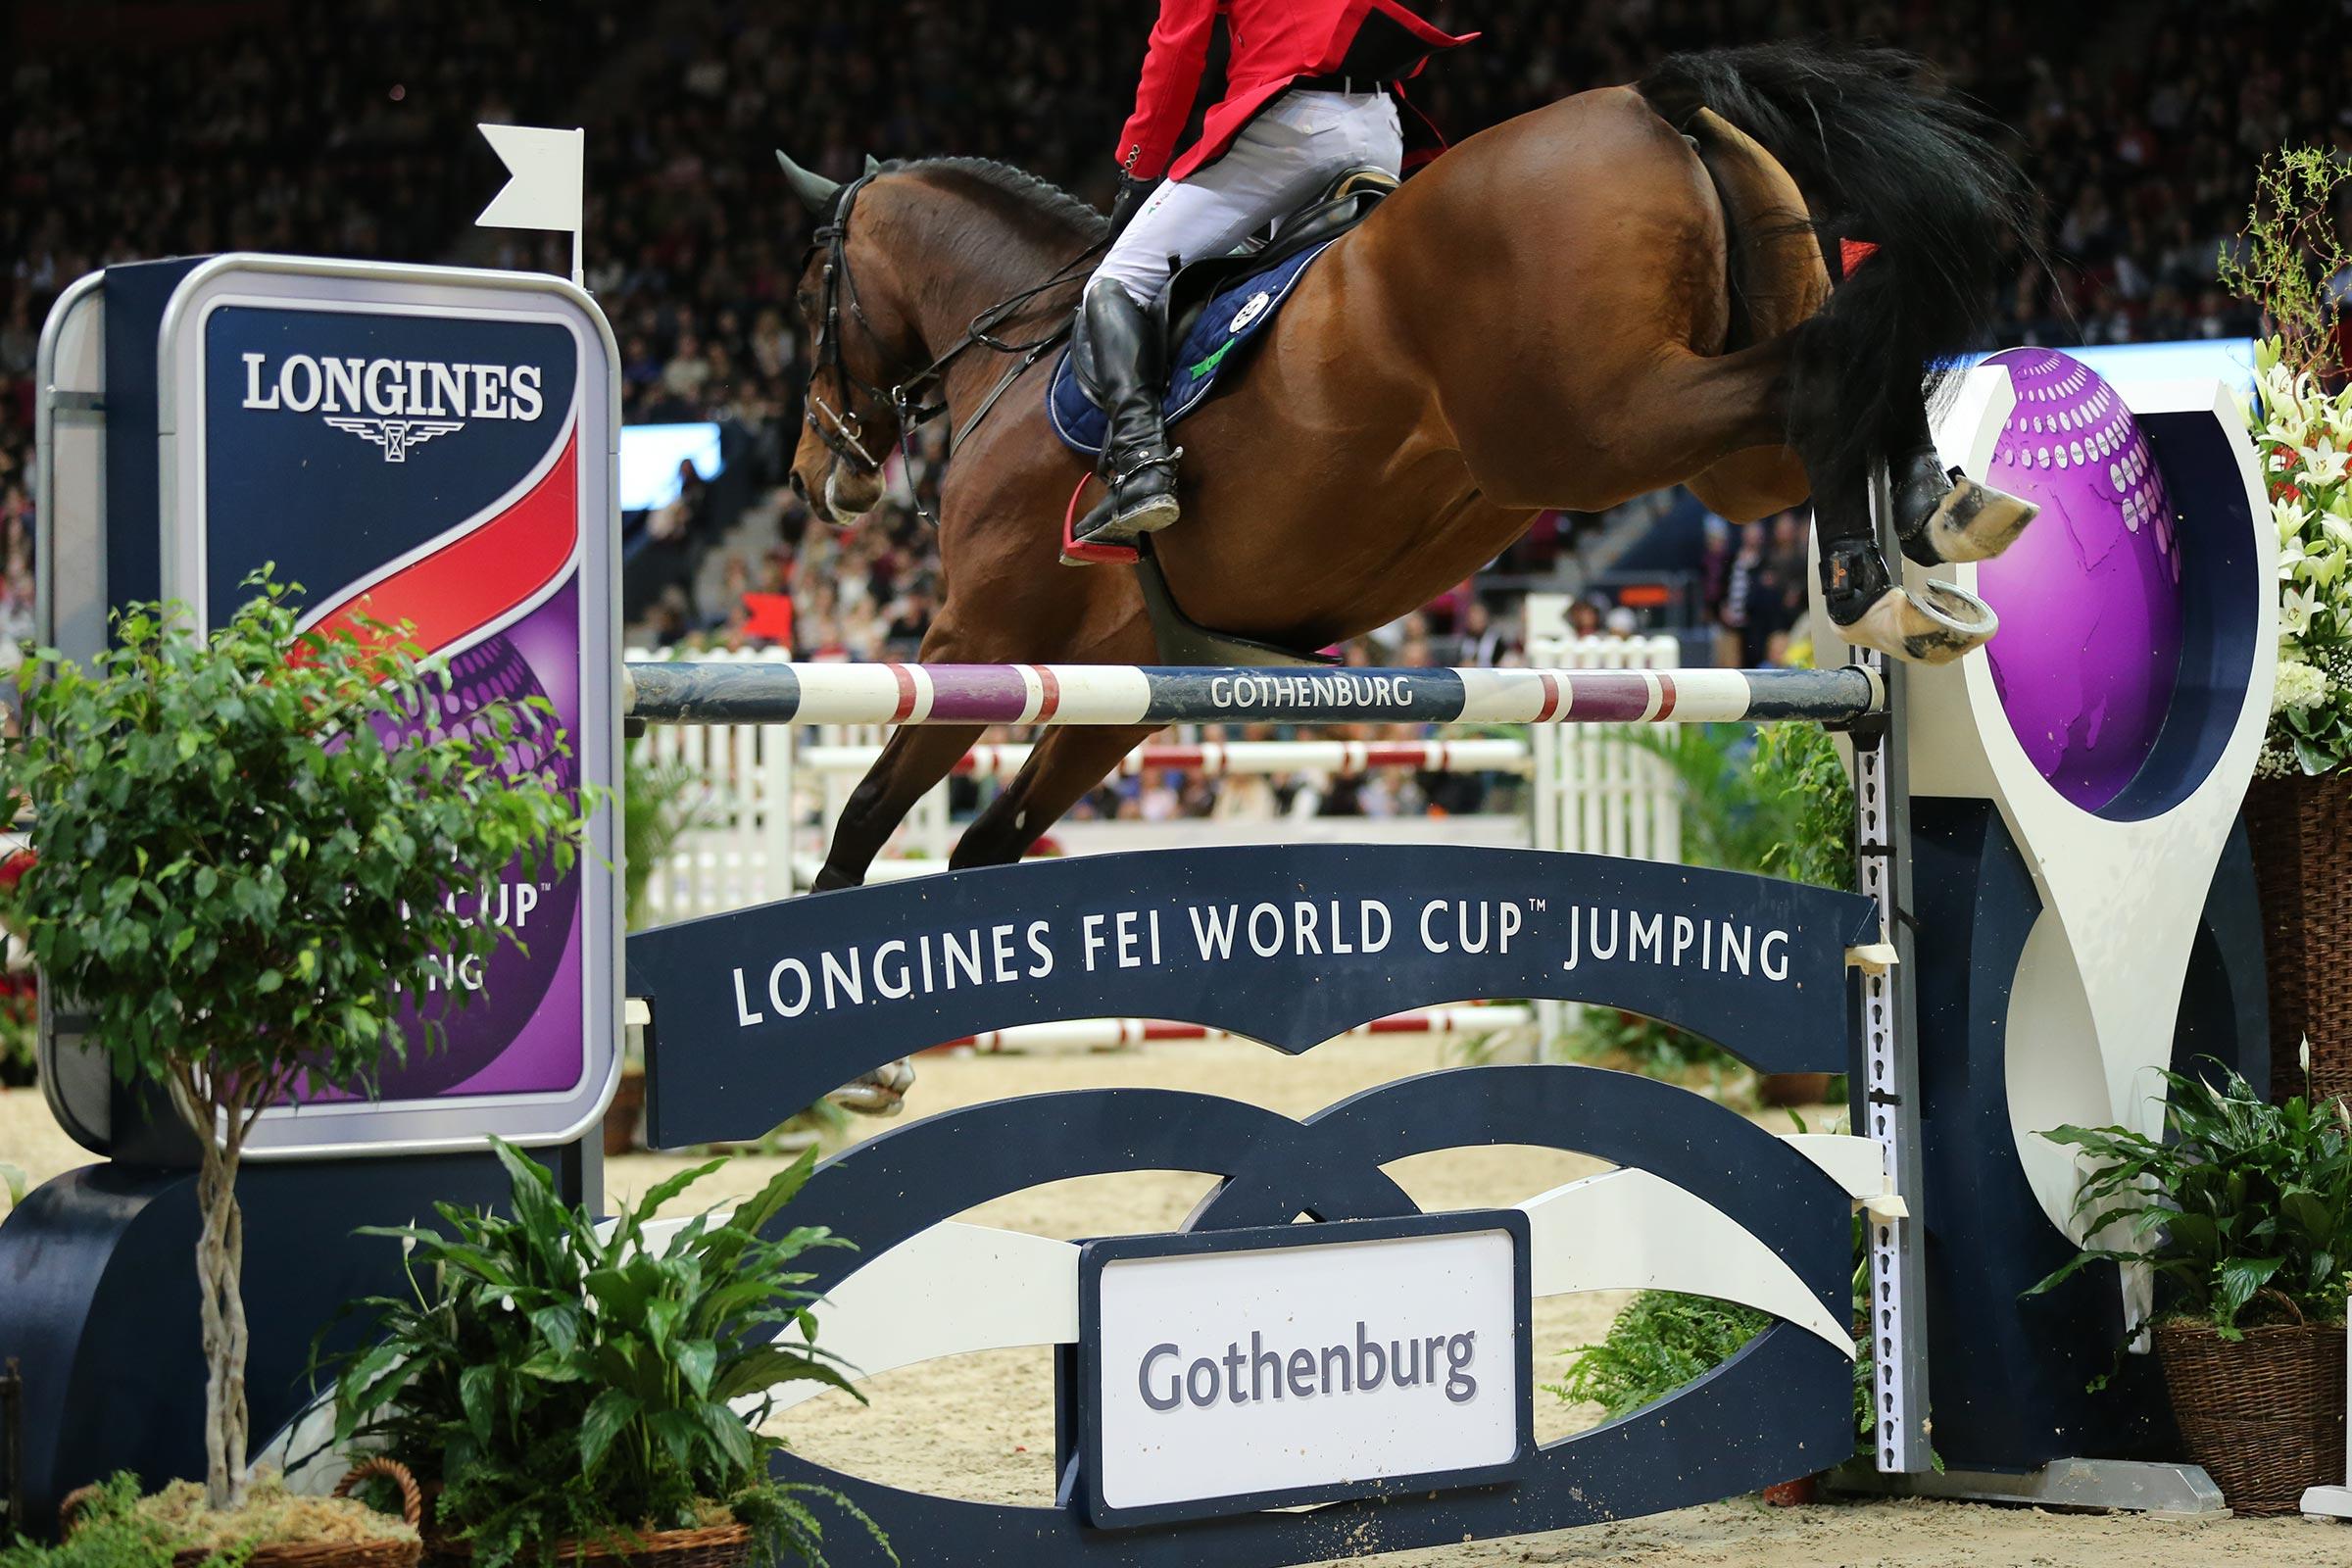 Longines-fei-world-cup-gothenburg-hopphinder-fj-4774